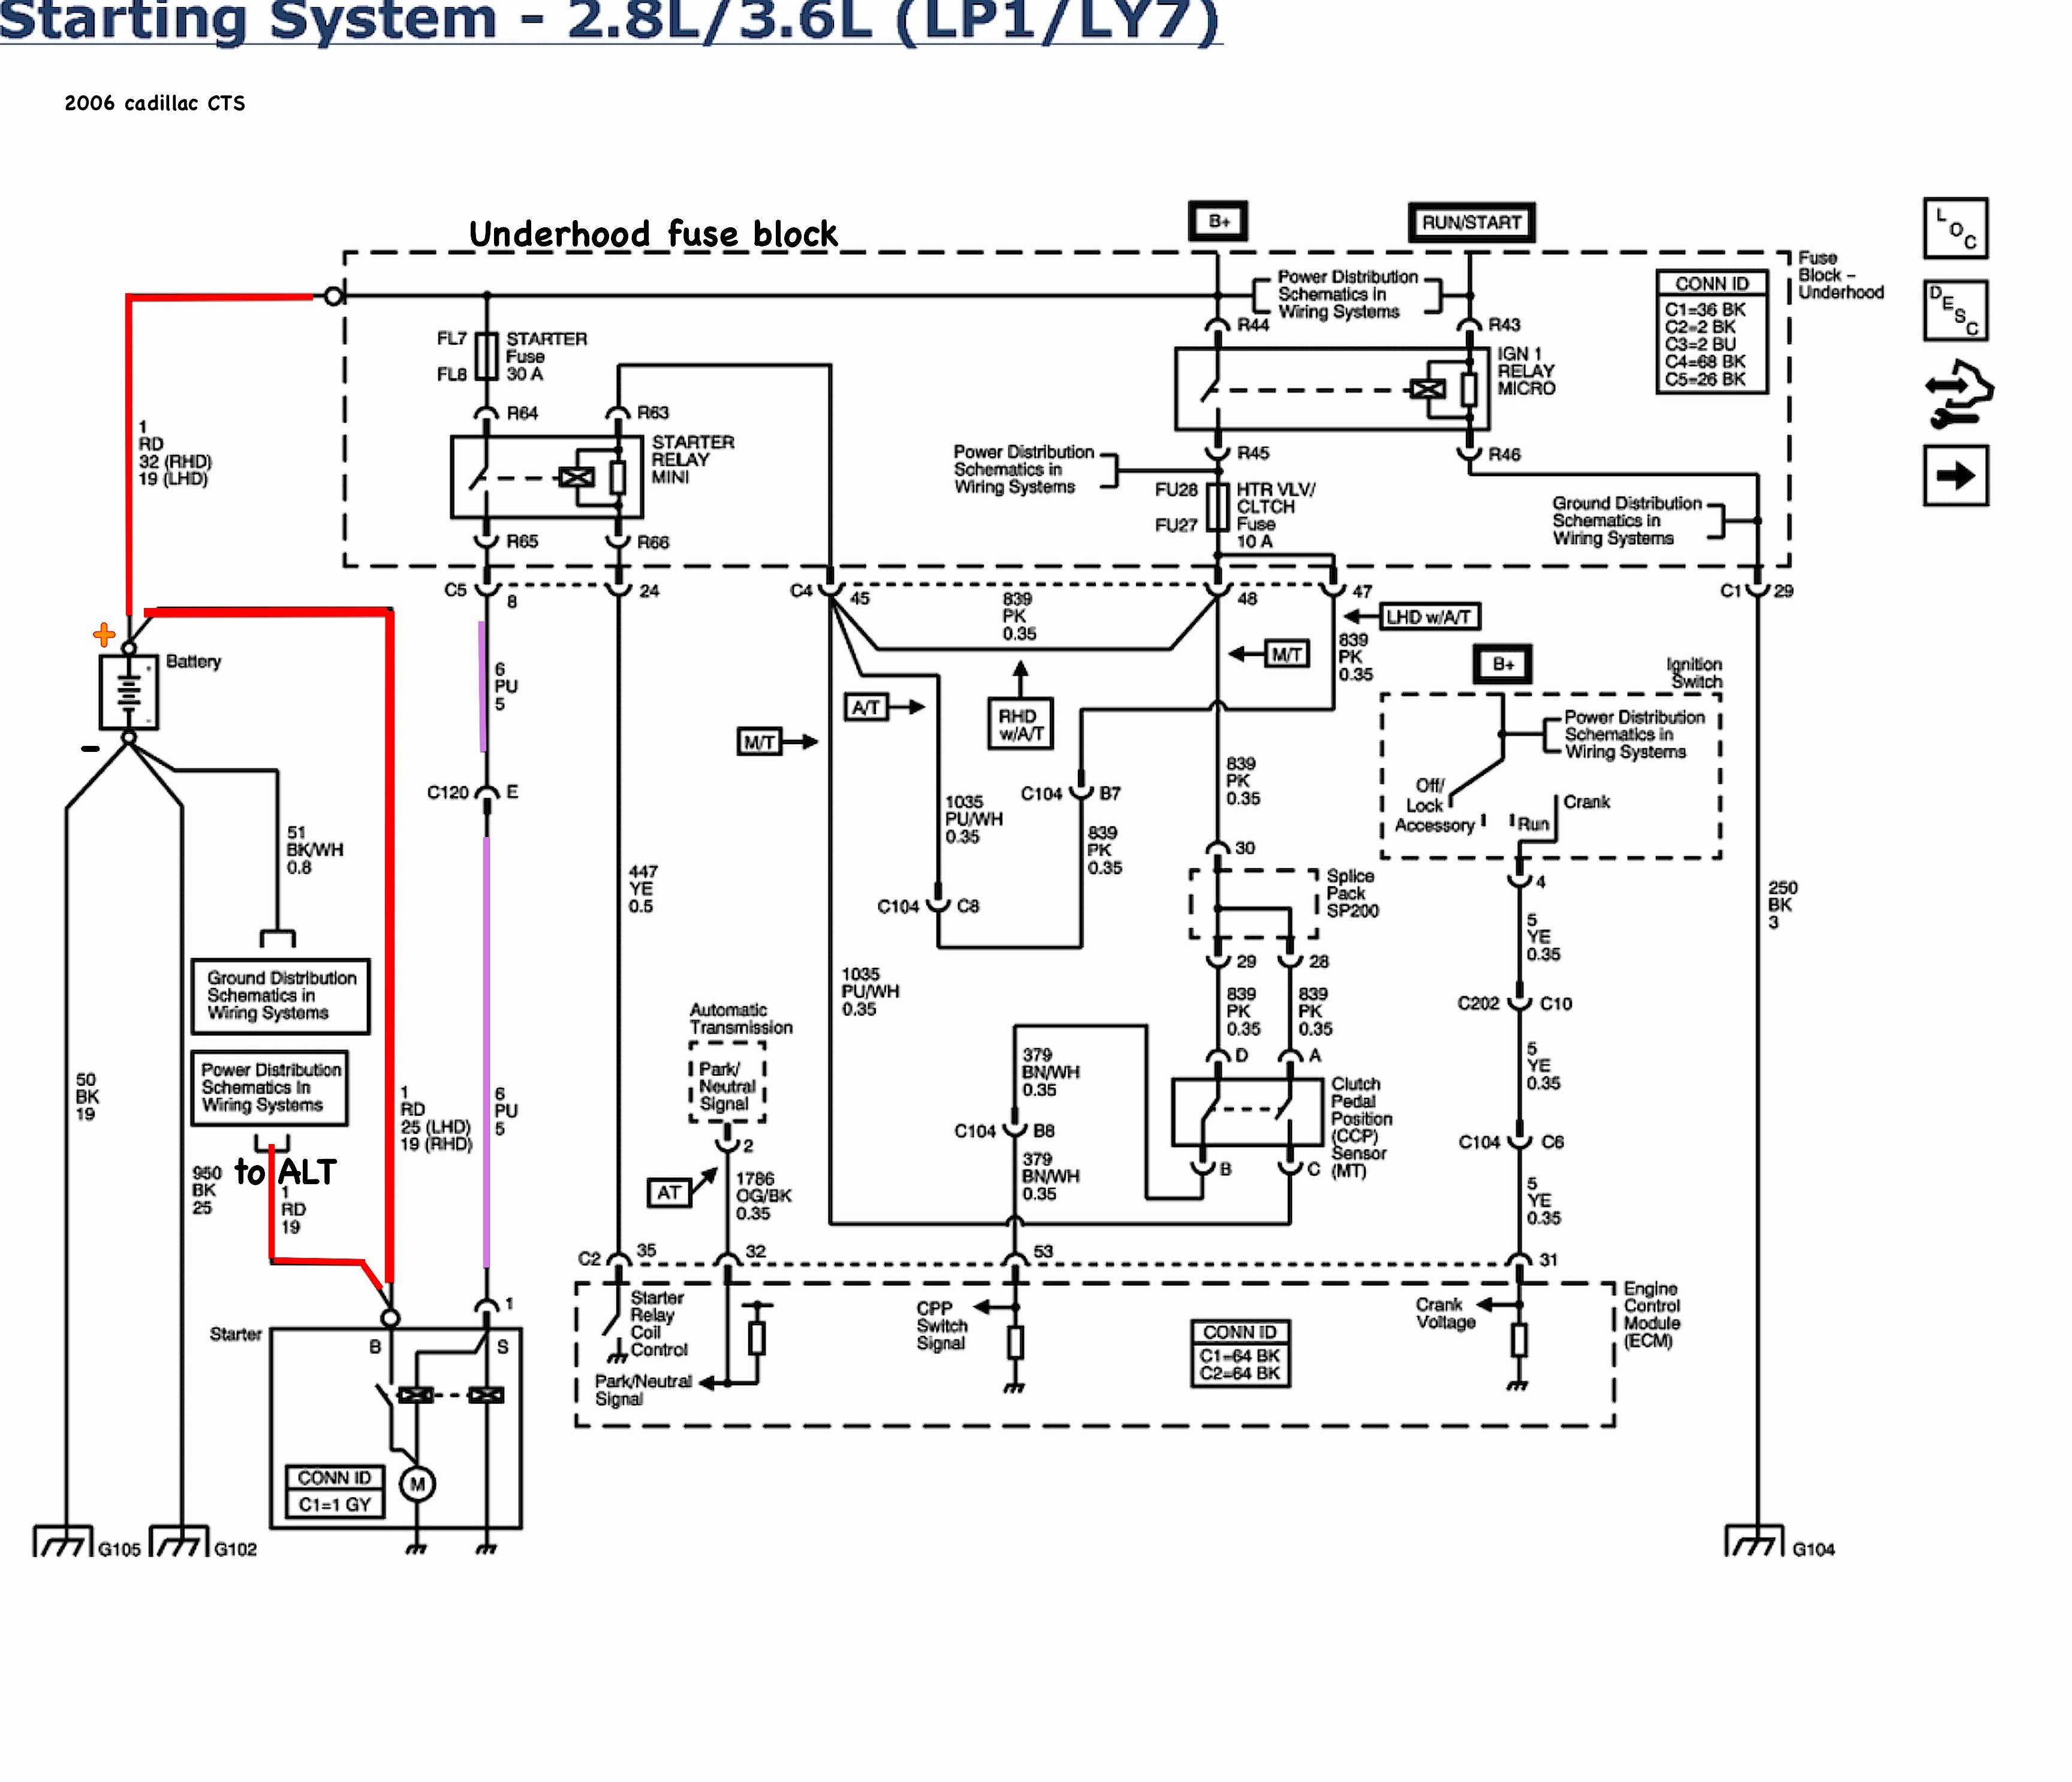 zf_0195] 2005 cadillac srx engine diagram wiring diagram  spoat usnes botse kargi eatte hisre hendil mohammedshrine librar wiring 101